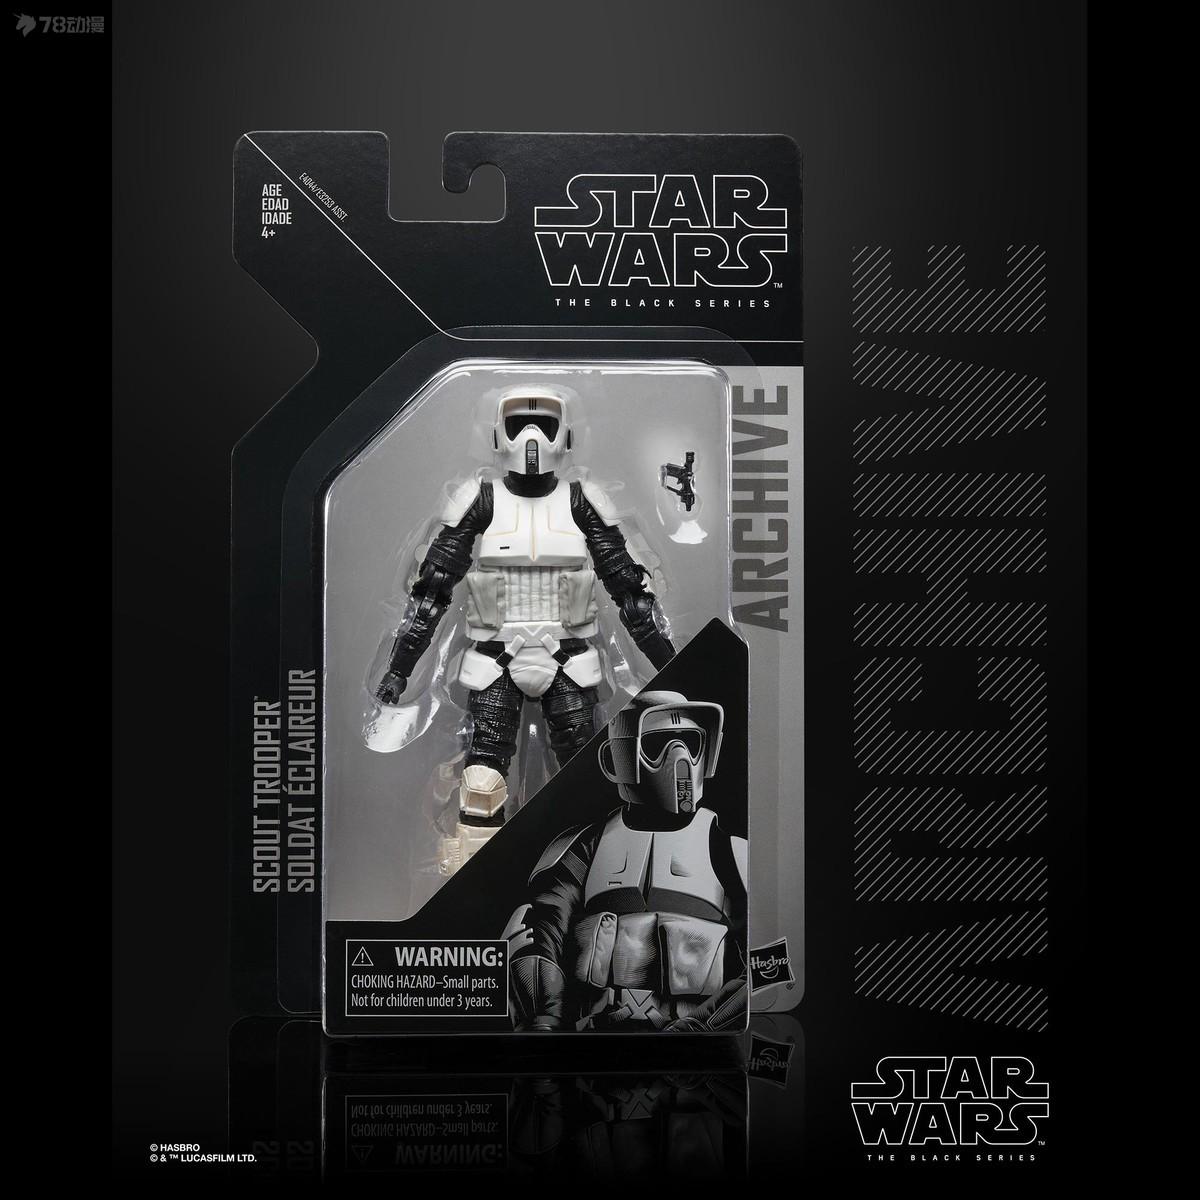 E4044_Star_Wars_The_Black_Series_Archive_Biker_Scout_Figure_02_2_2000x.jpg